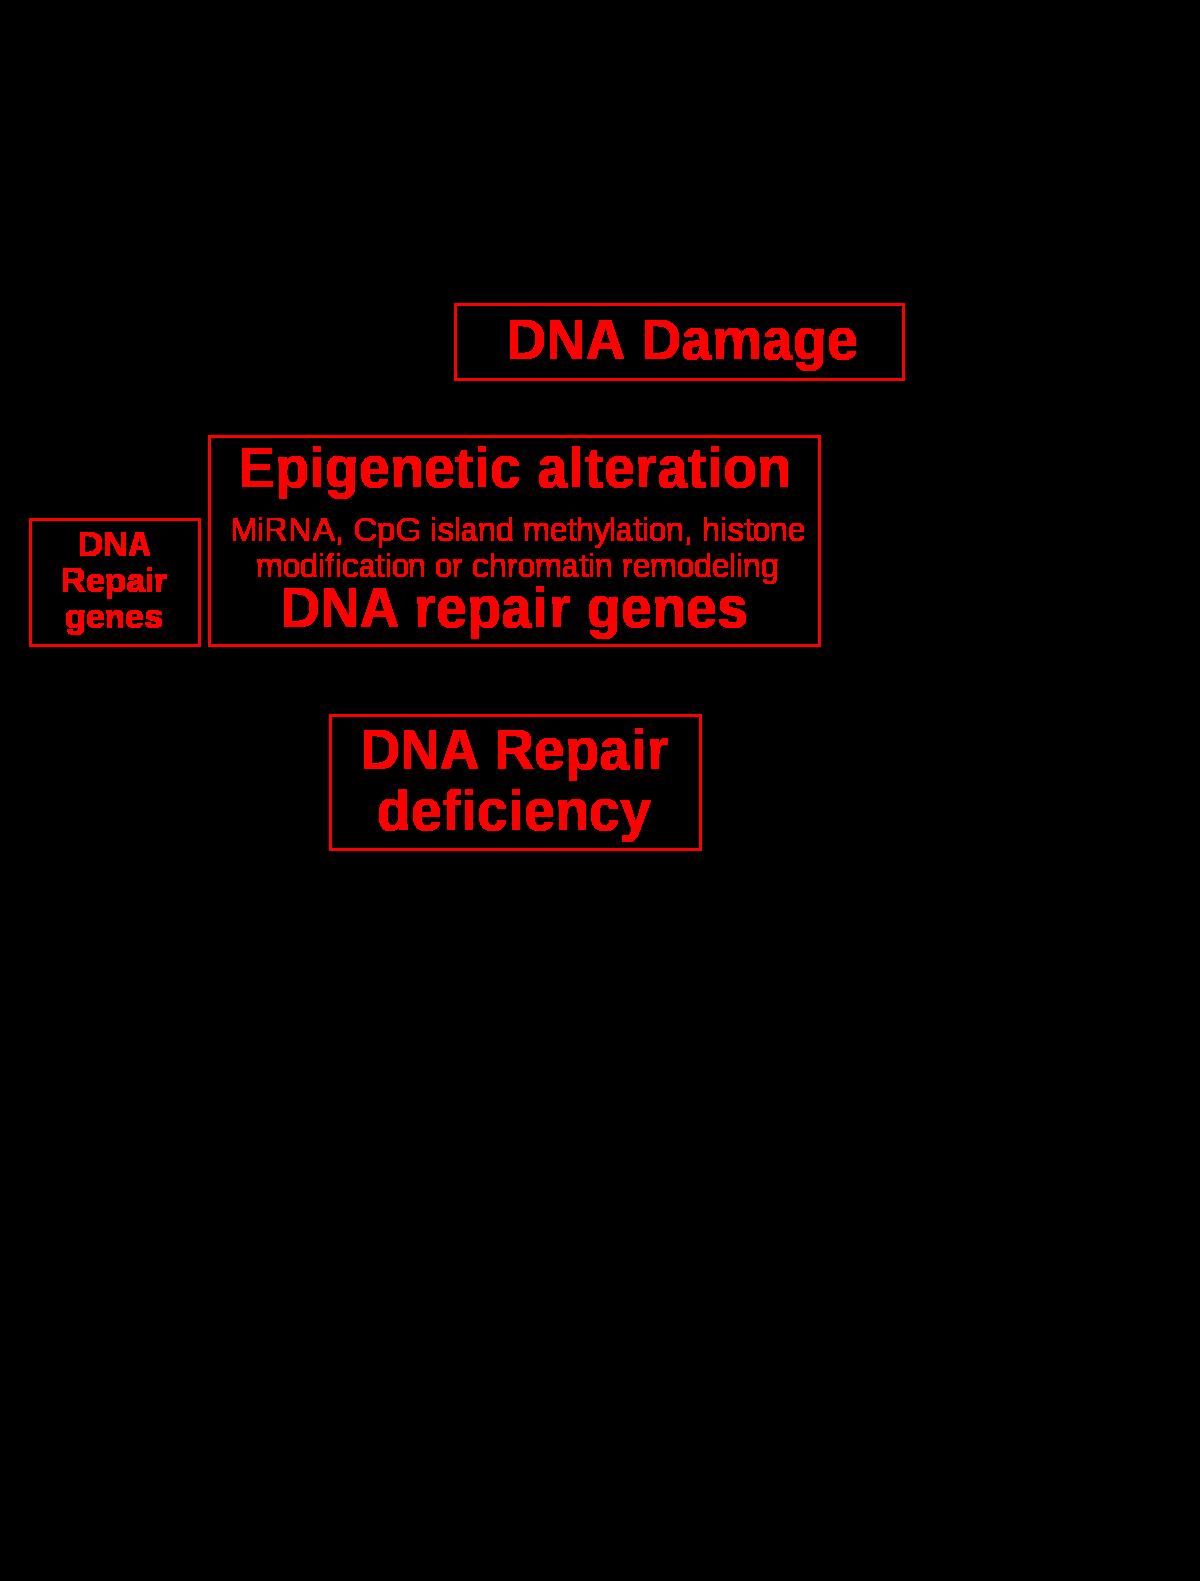 endometrium genetikai rákja)